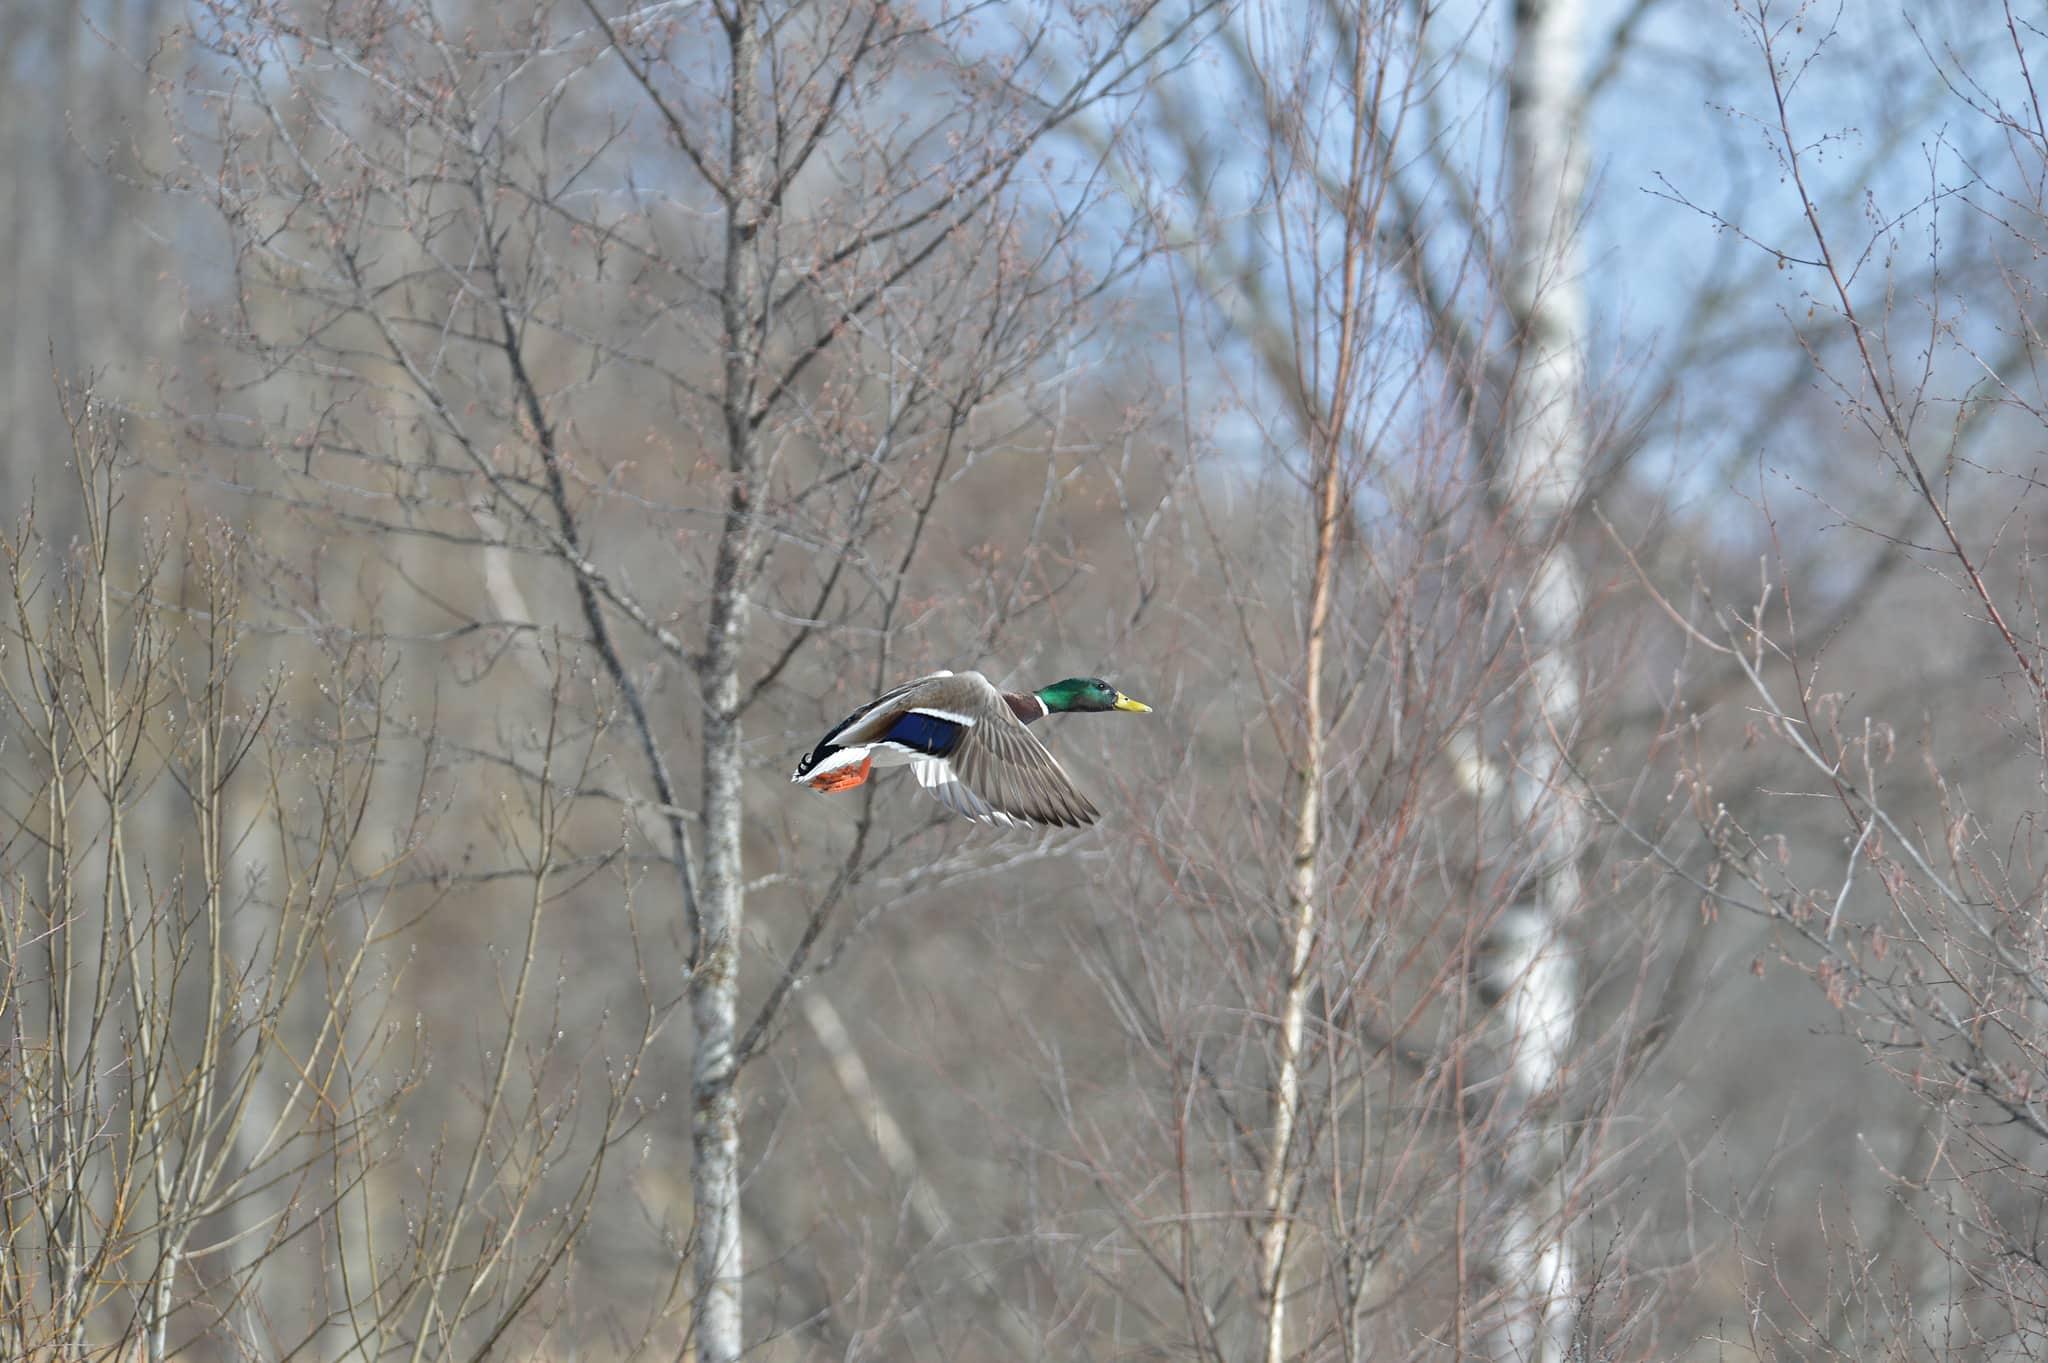 En norsk studie på fågel föreslår kantzoner mot vattendrag på minst 30 meter. Foto: Kenneth Johansson